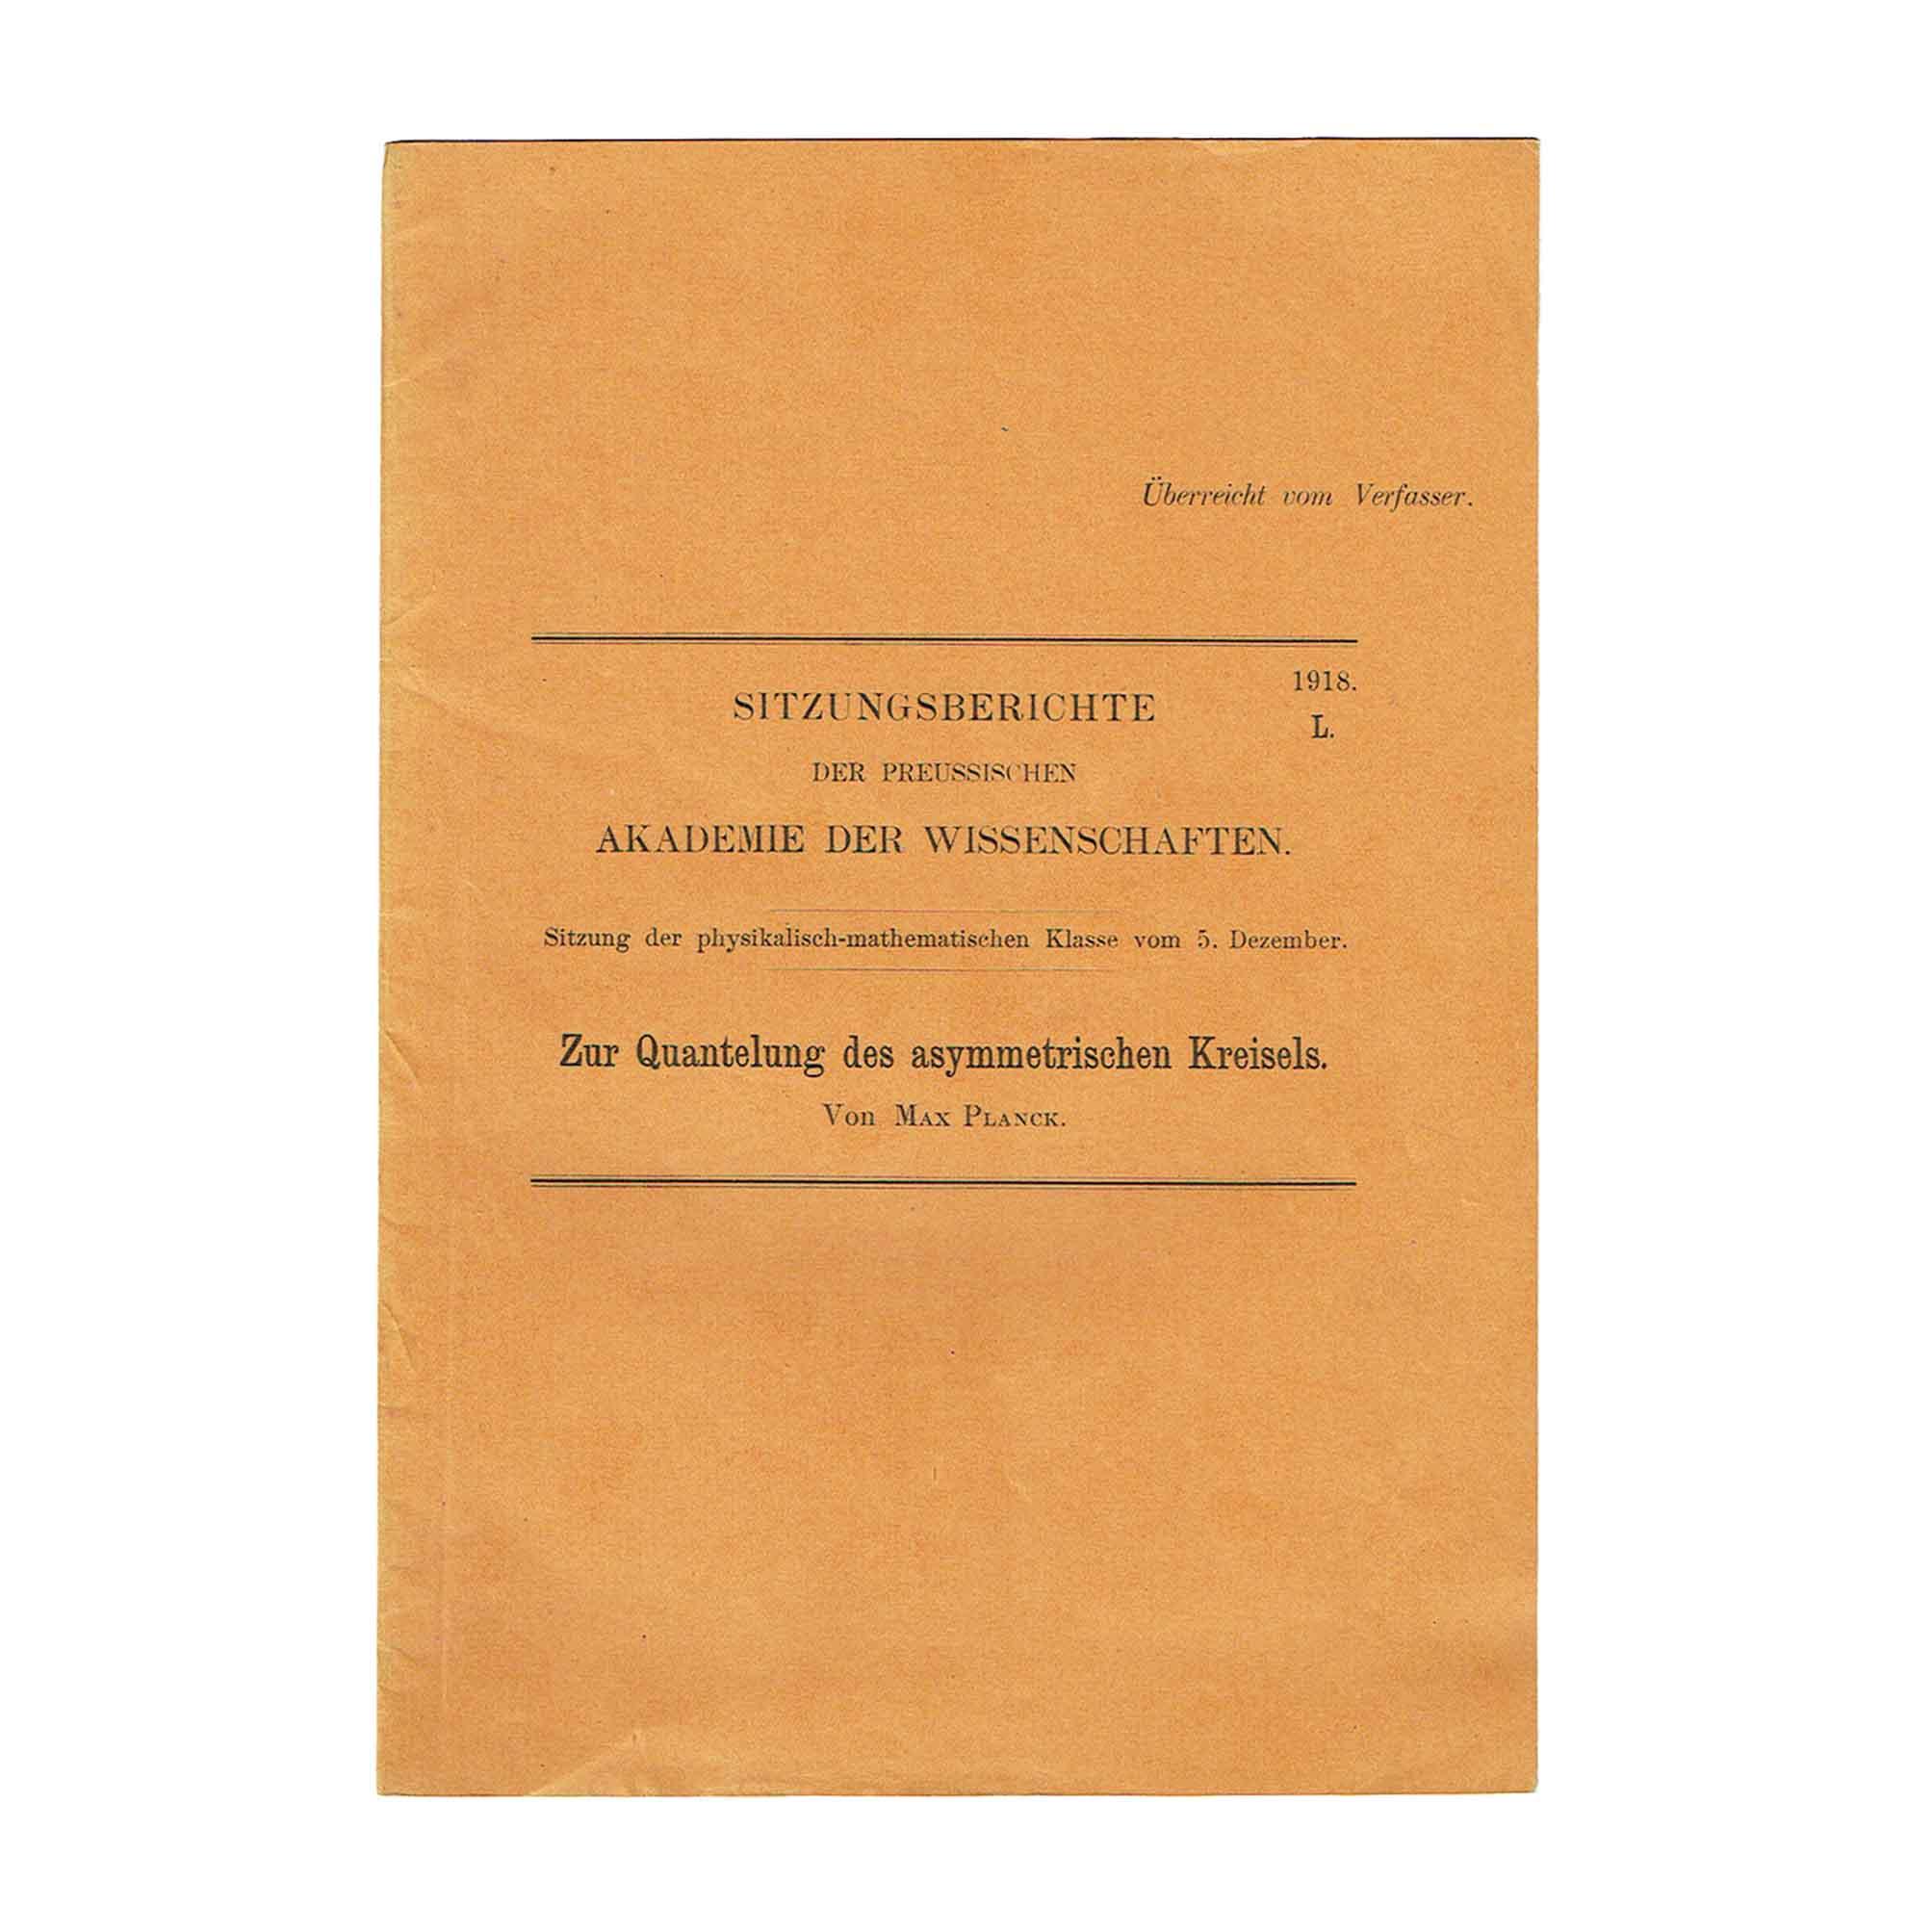 5858-Planck-Quantelung-Presentation-Offprint-1918-Cover-recto-free-N.jpeg